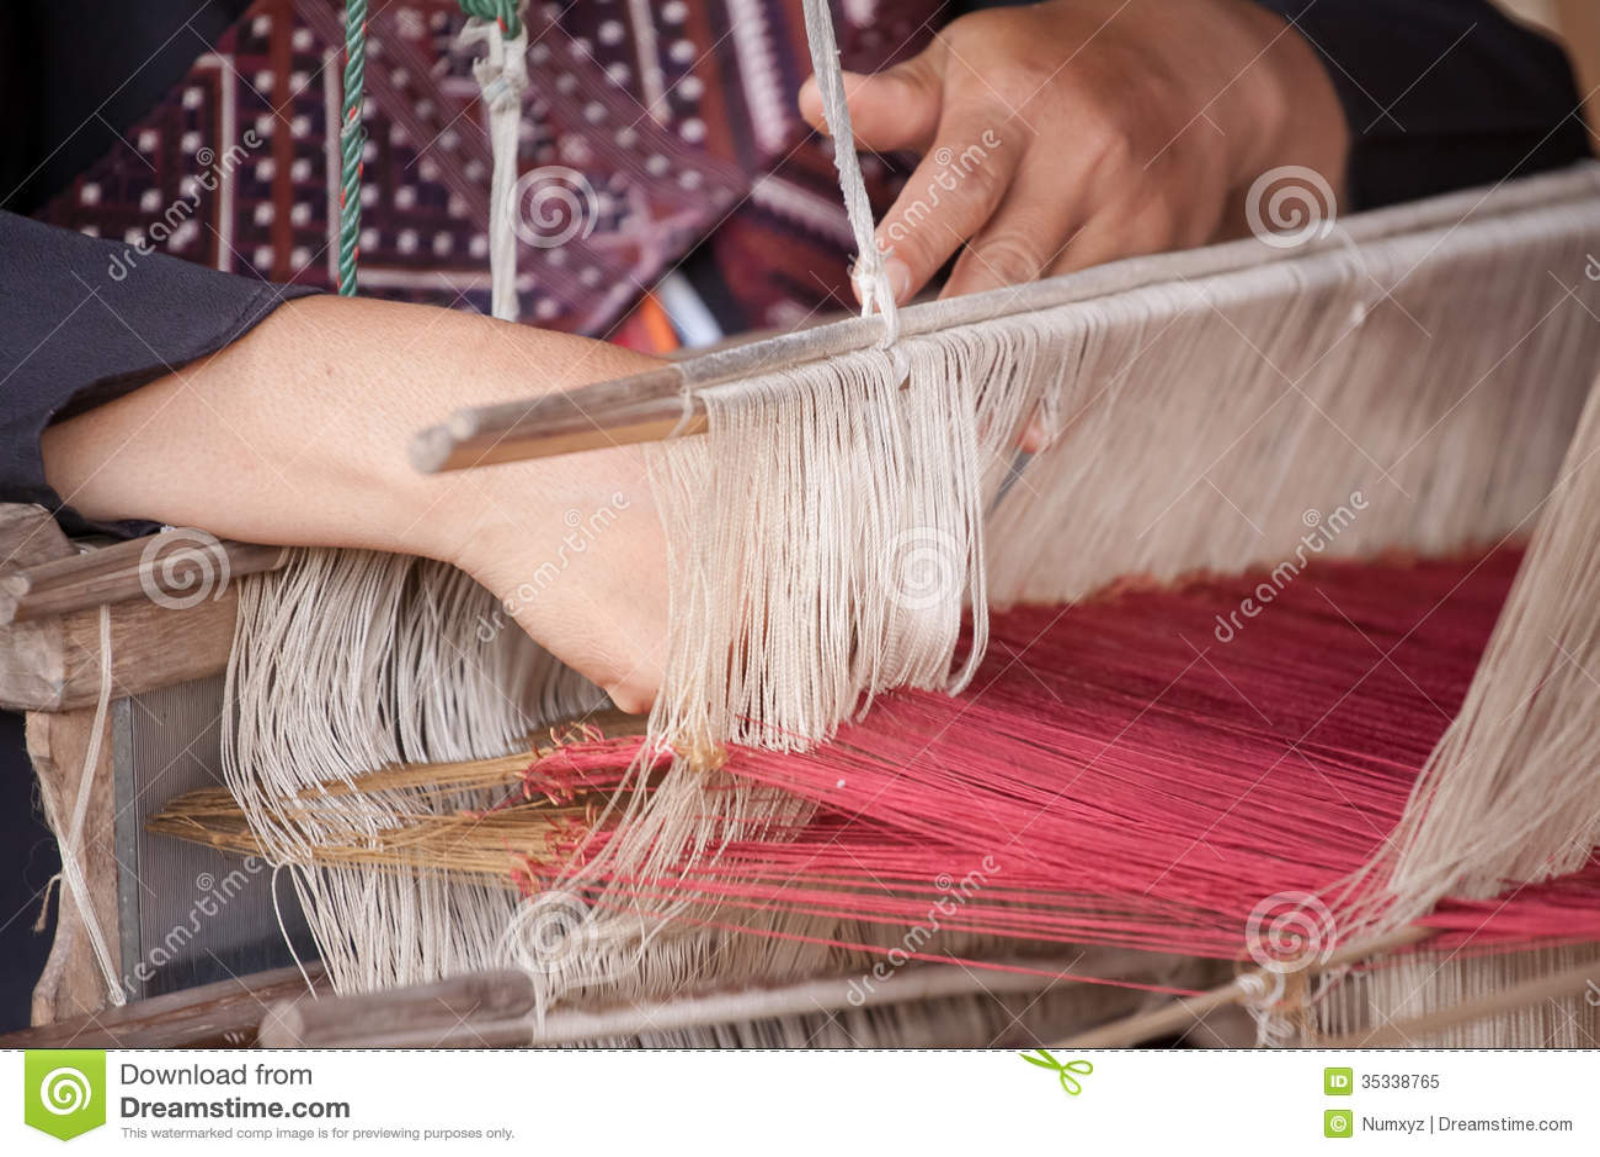 Vietnam traditional clothing